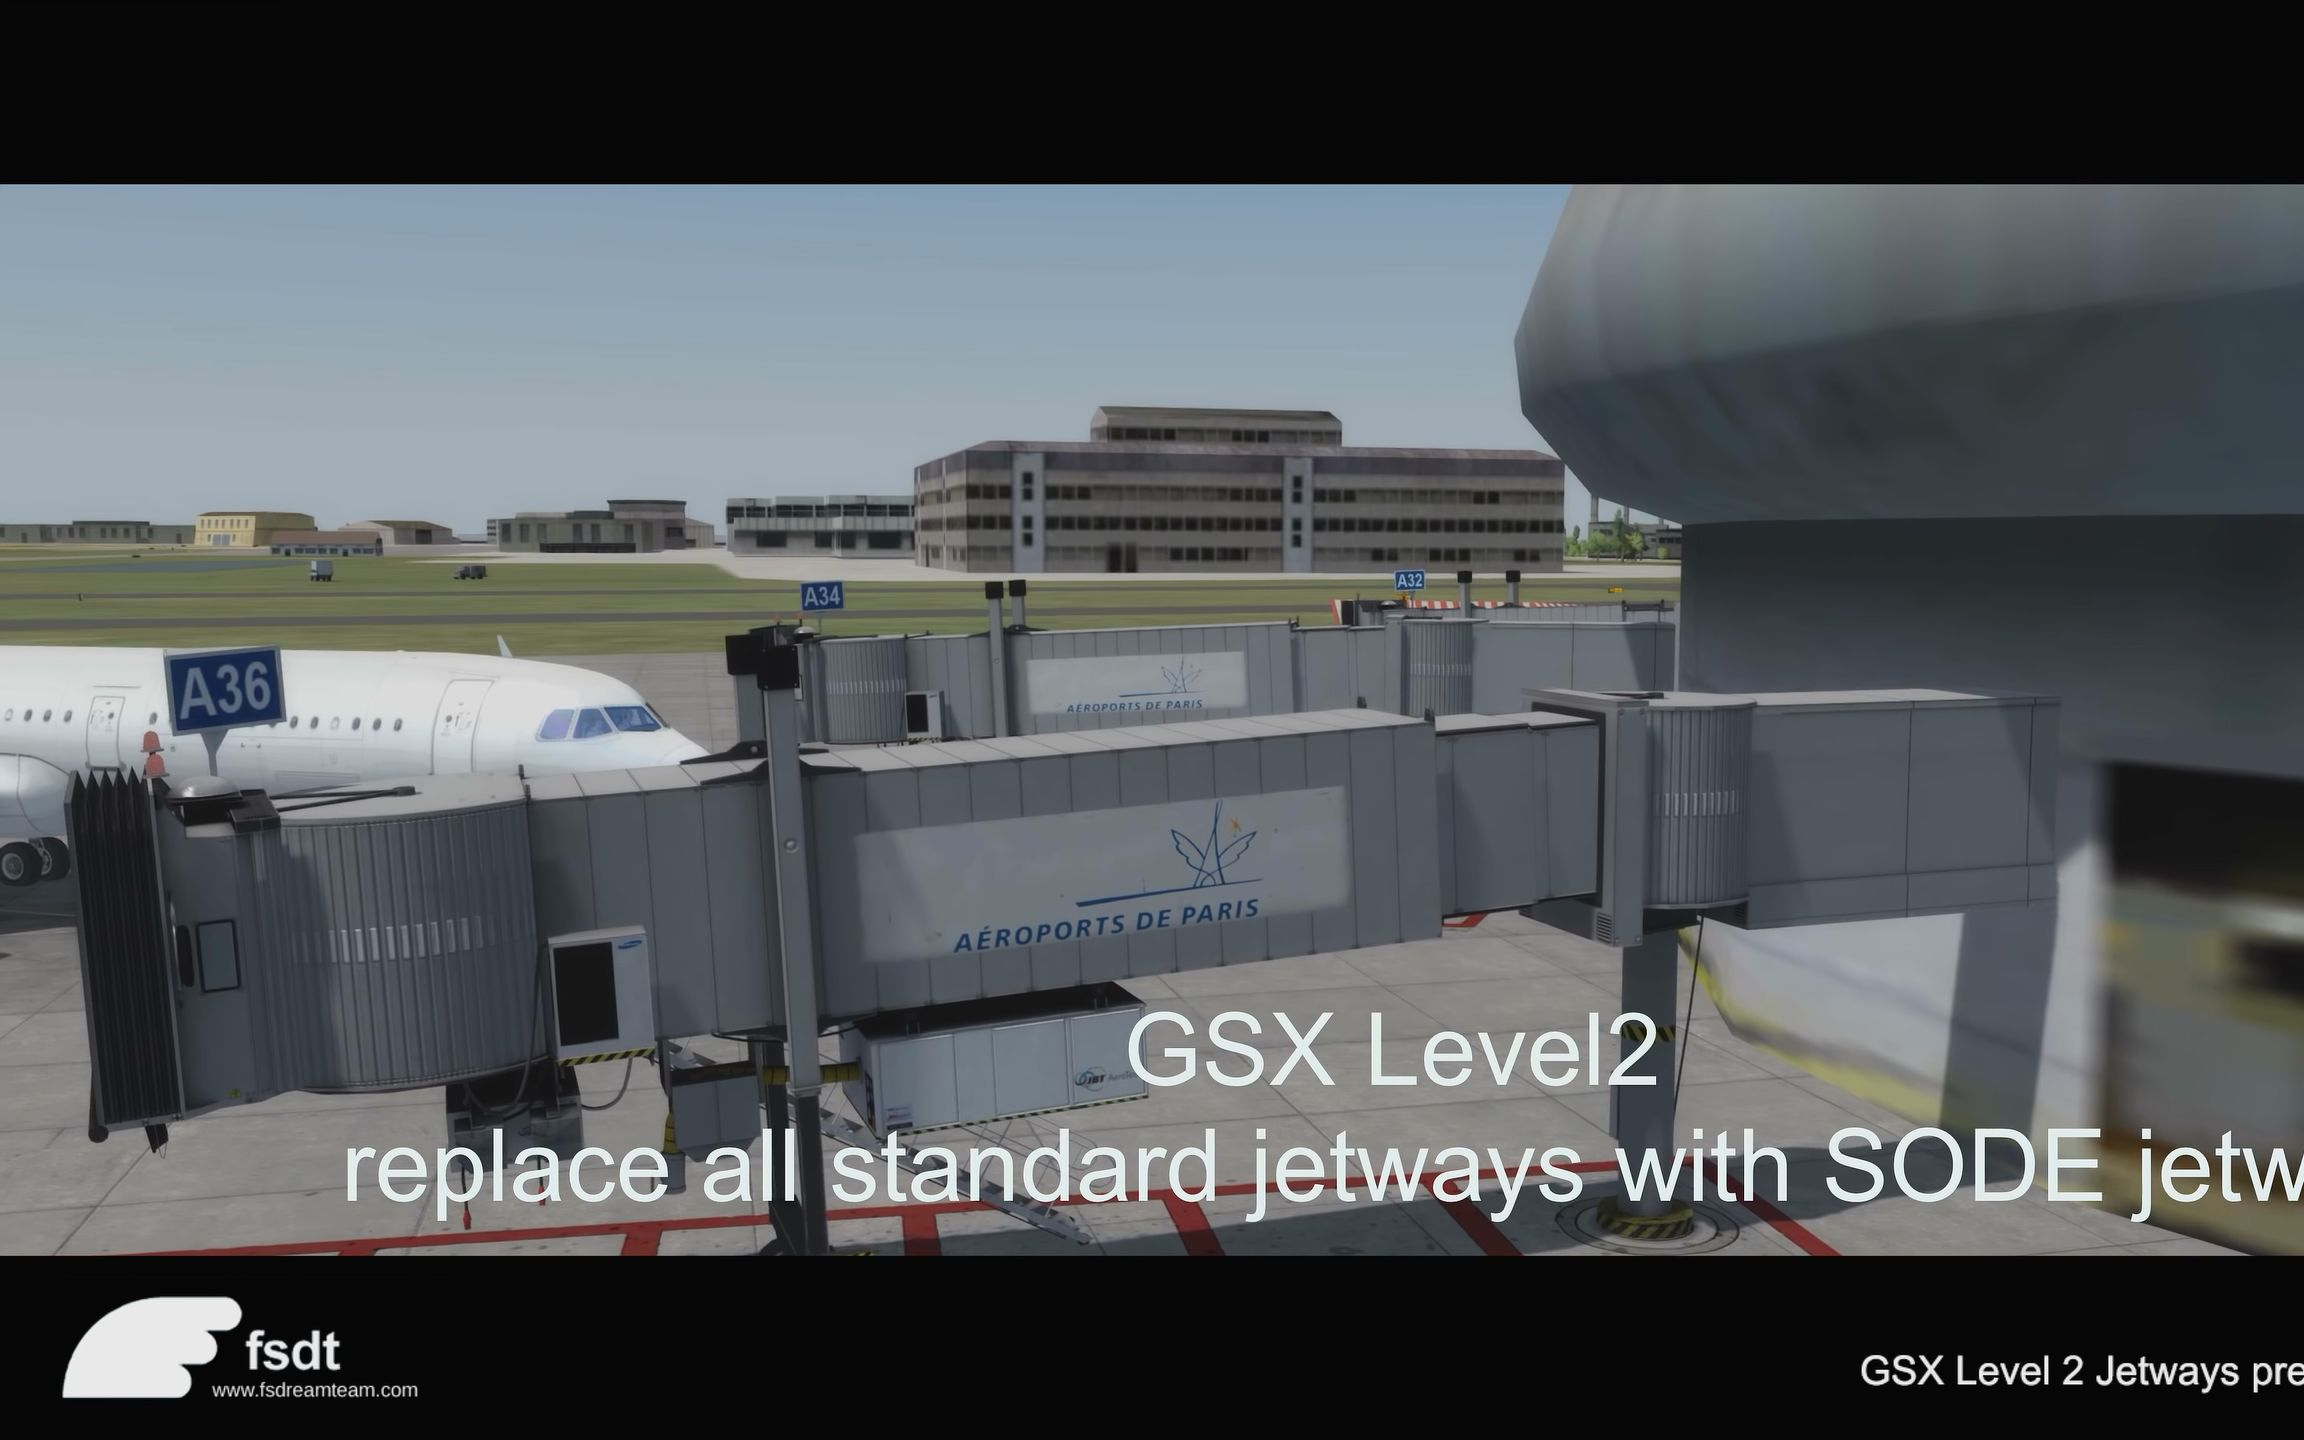 GSX Level 2中廊桥部分的演示_哔哩哔哩 (゜-゜)つロ 干杯~-bilibili